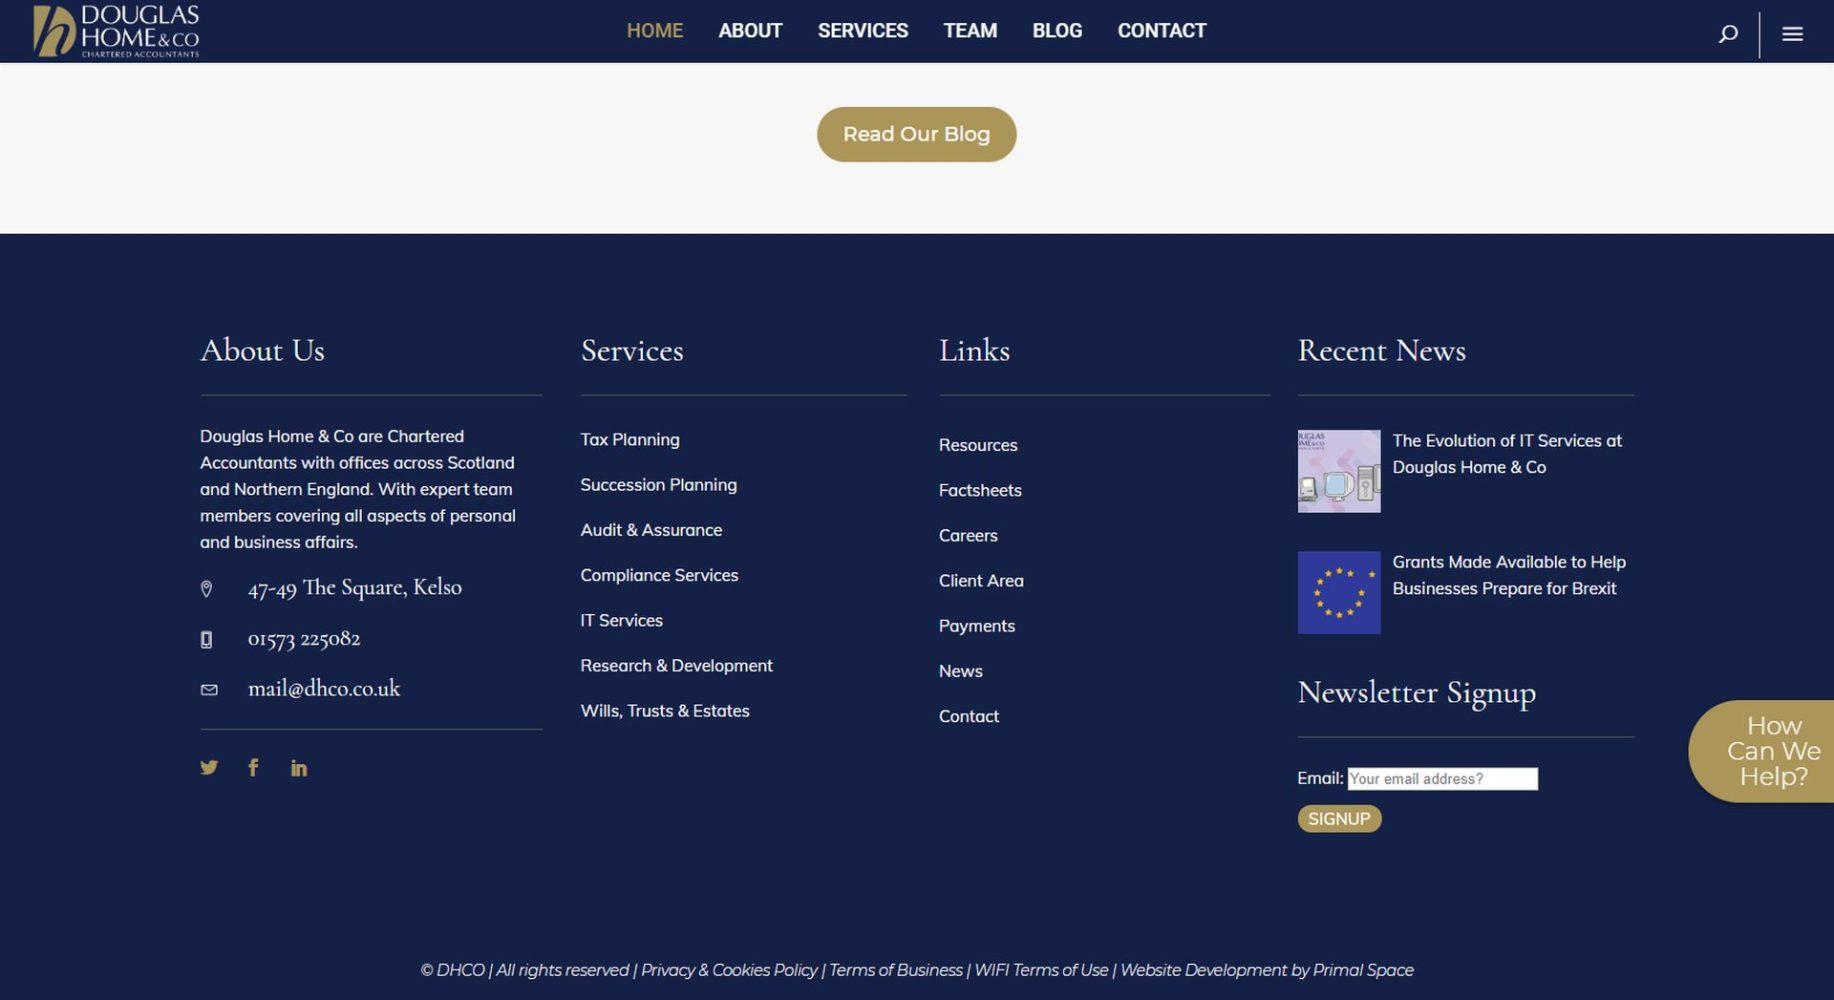 Douglas Home & Co Website Design Footer